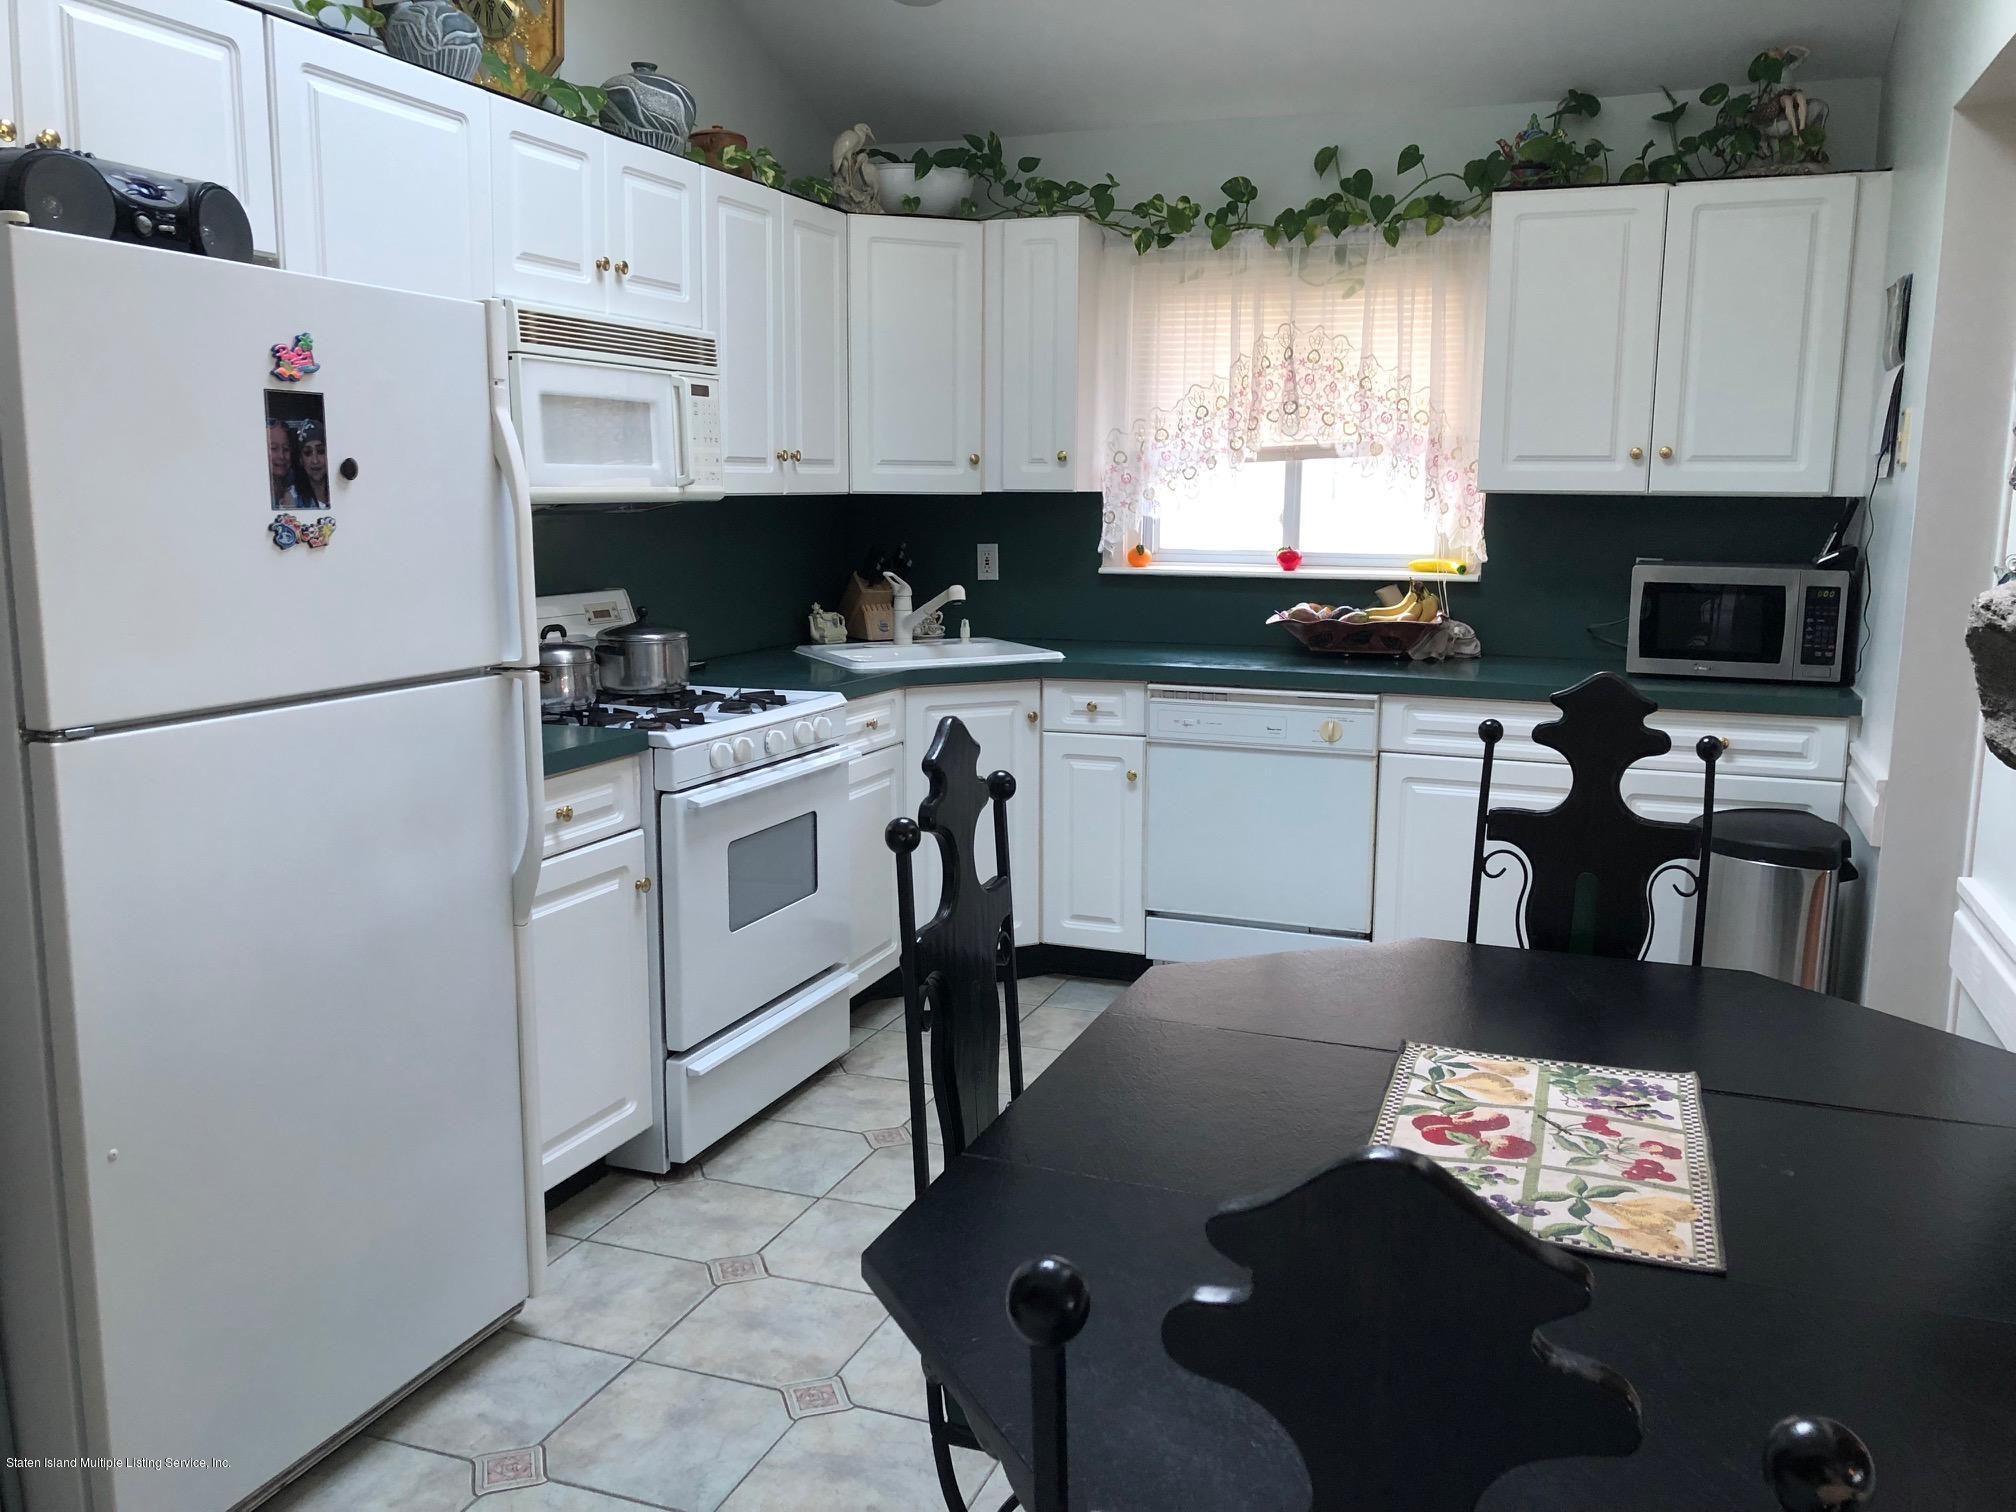 Single Family - Detached 26 Deserre Avenue  Staten Island, NY 10312, MLS-1118007-11